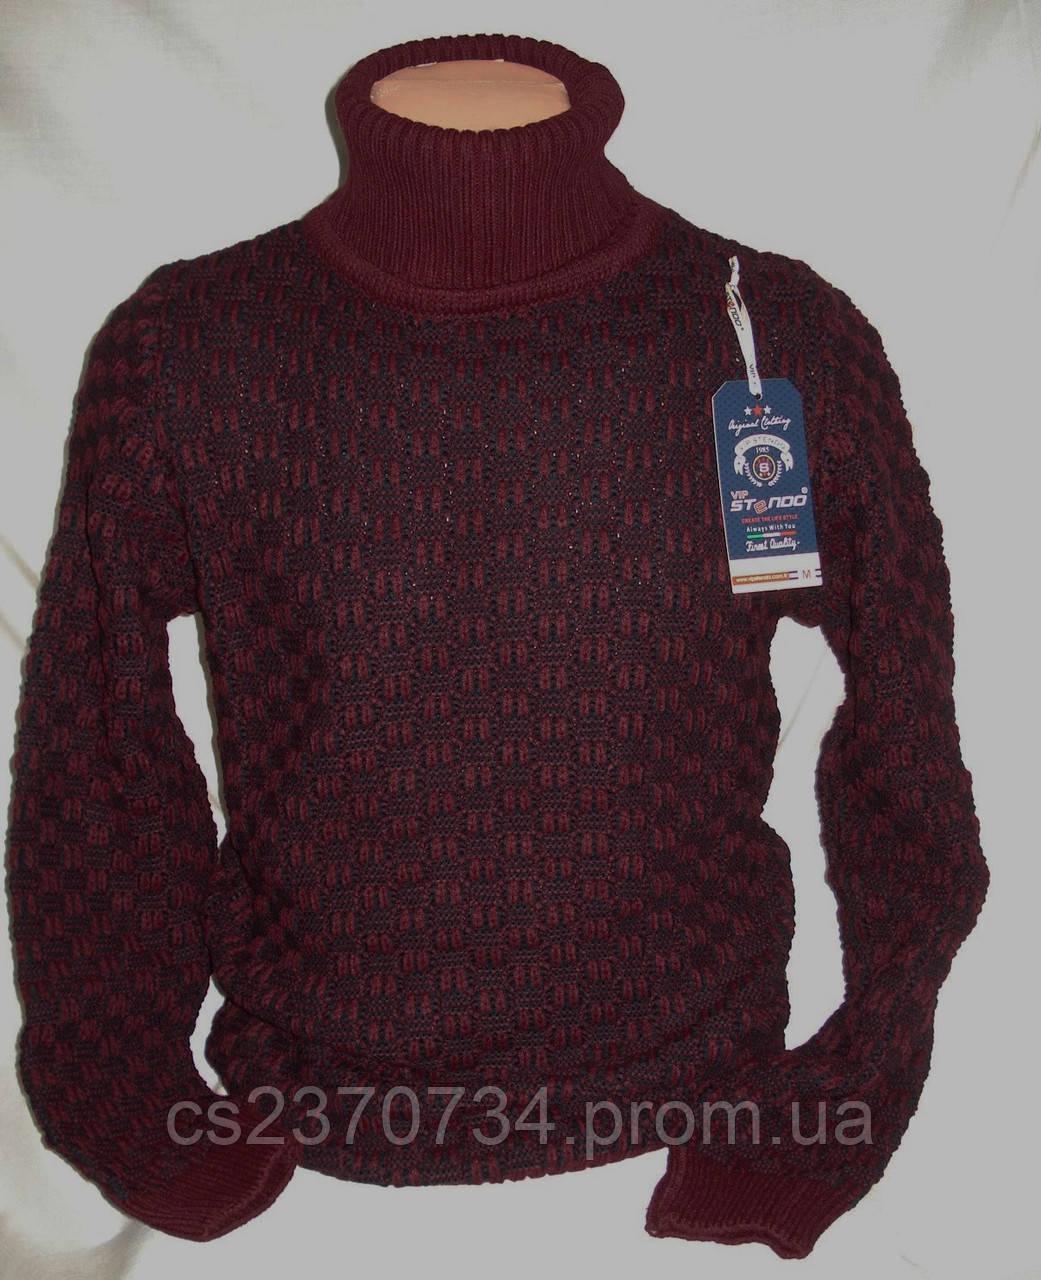 Свитер-хомут Vip Stendo мужской  бордо меланж    M, L,XL